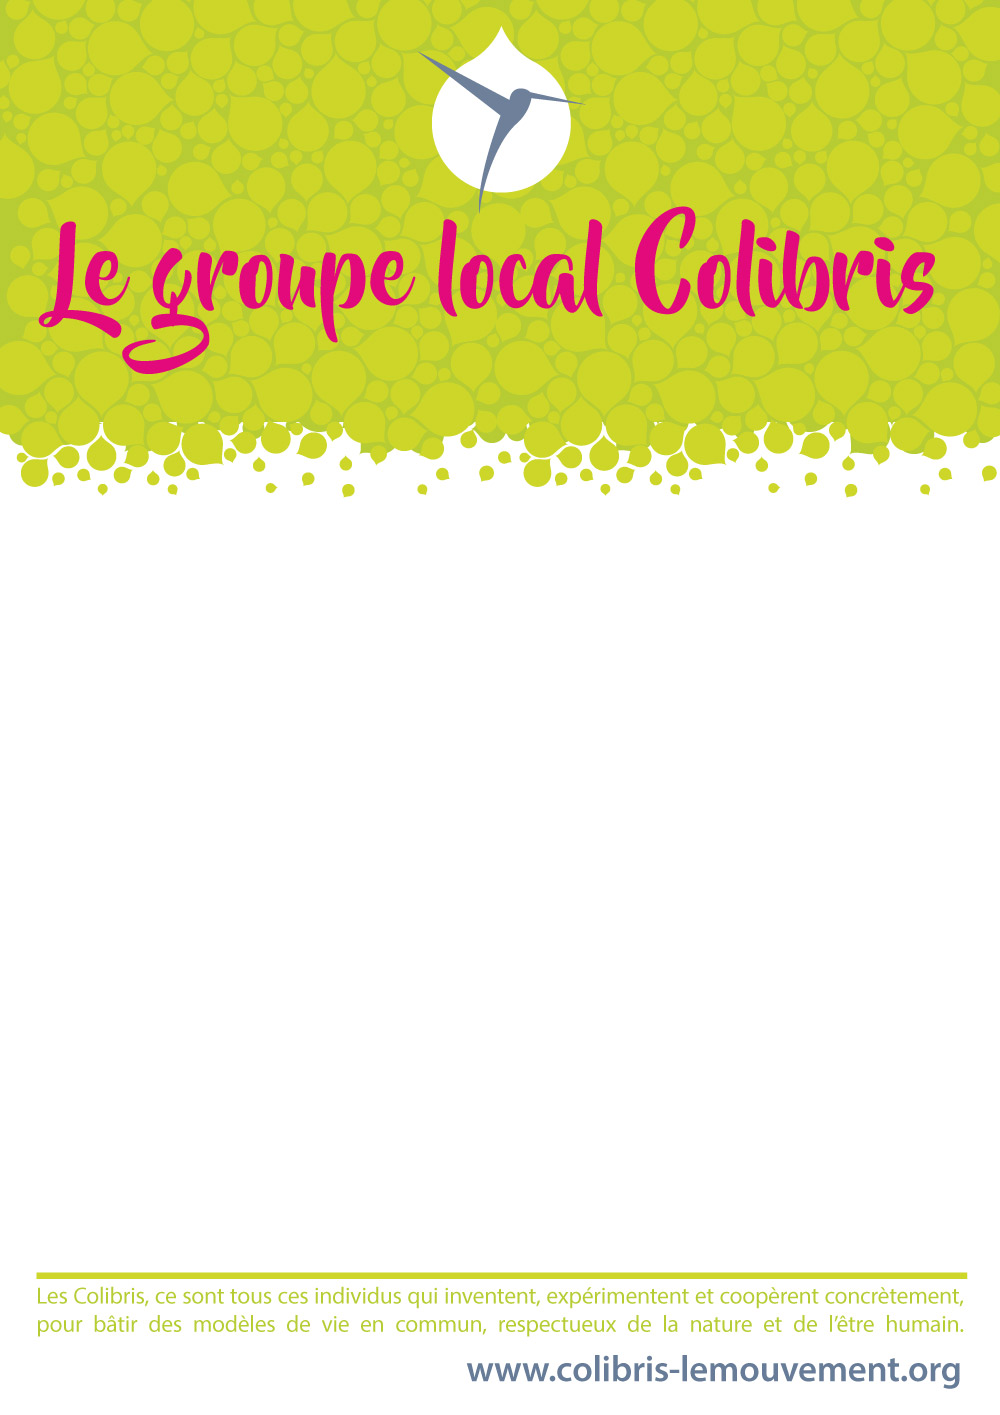 image affichetypeColibris2.jpg (0.2MB)